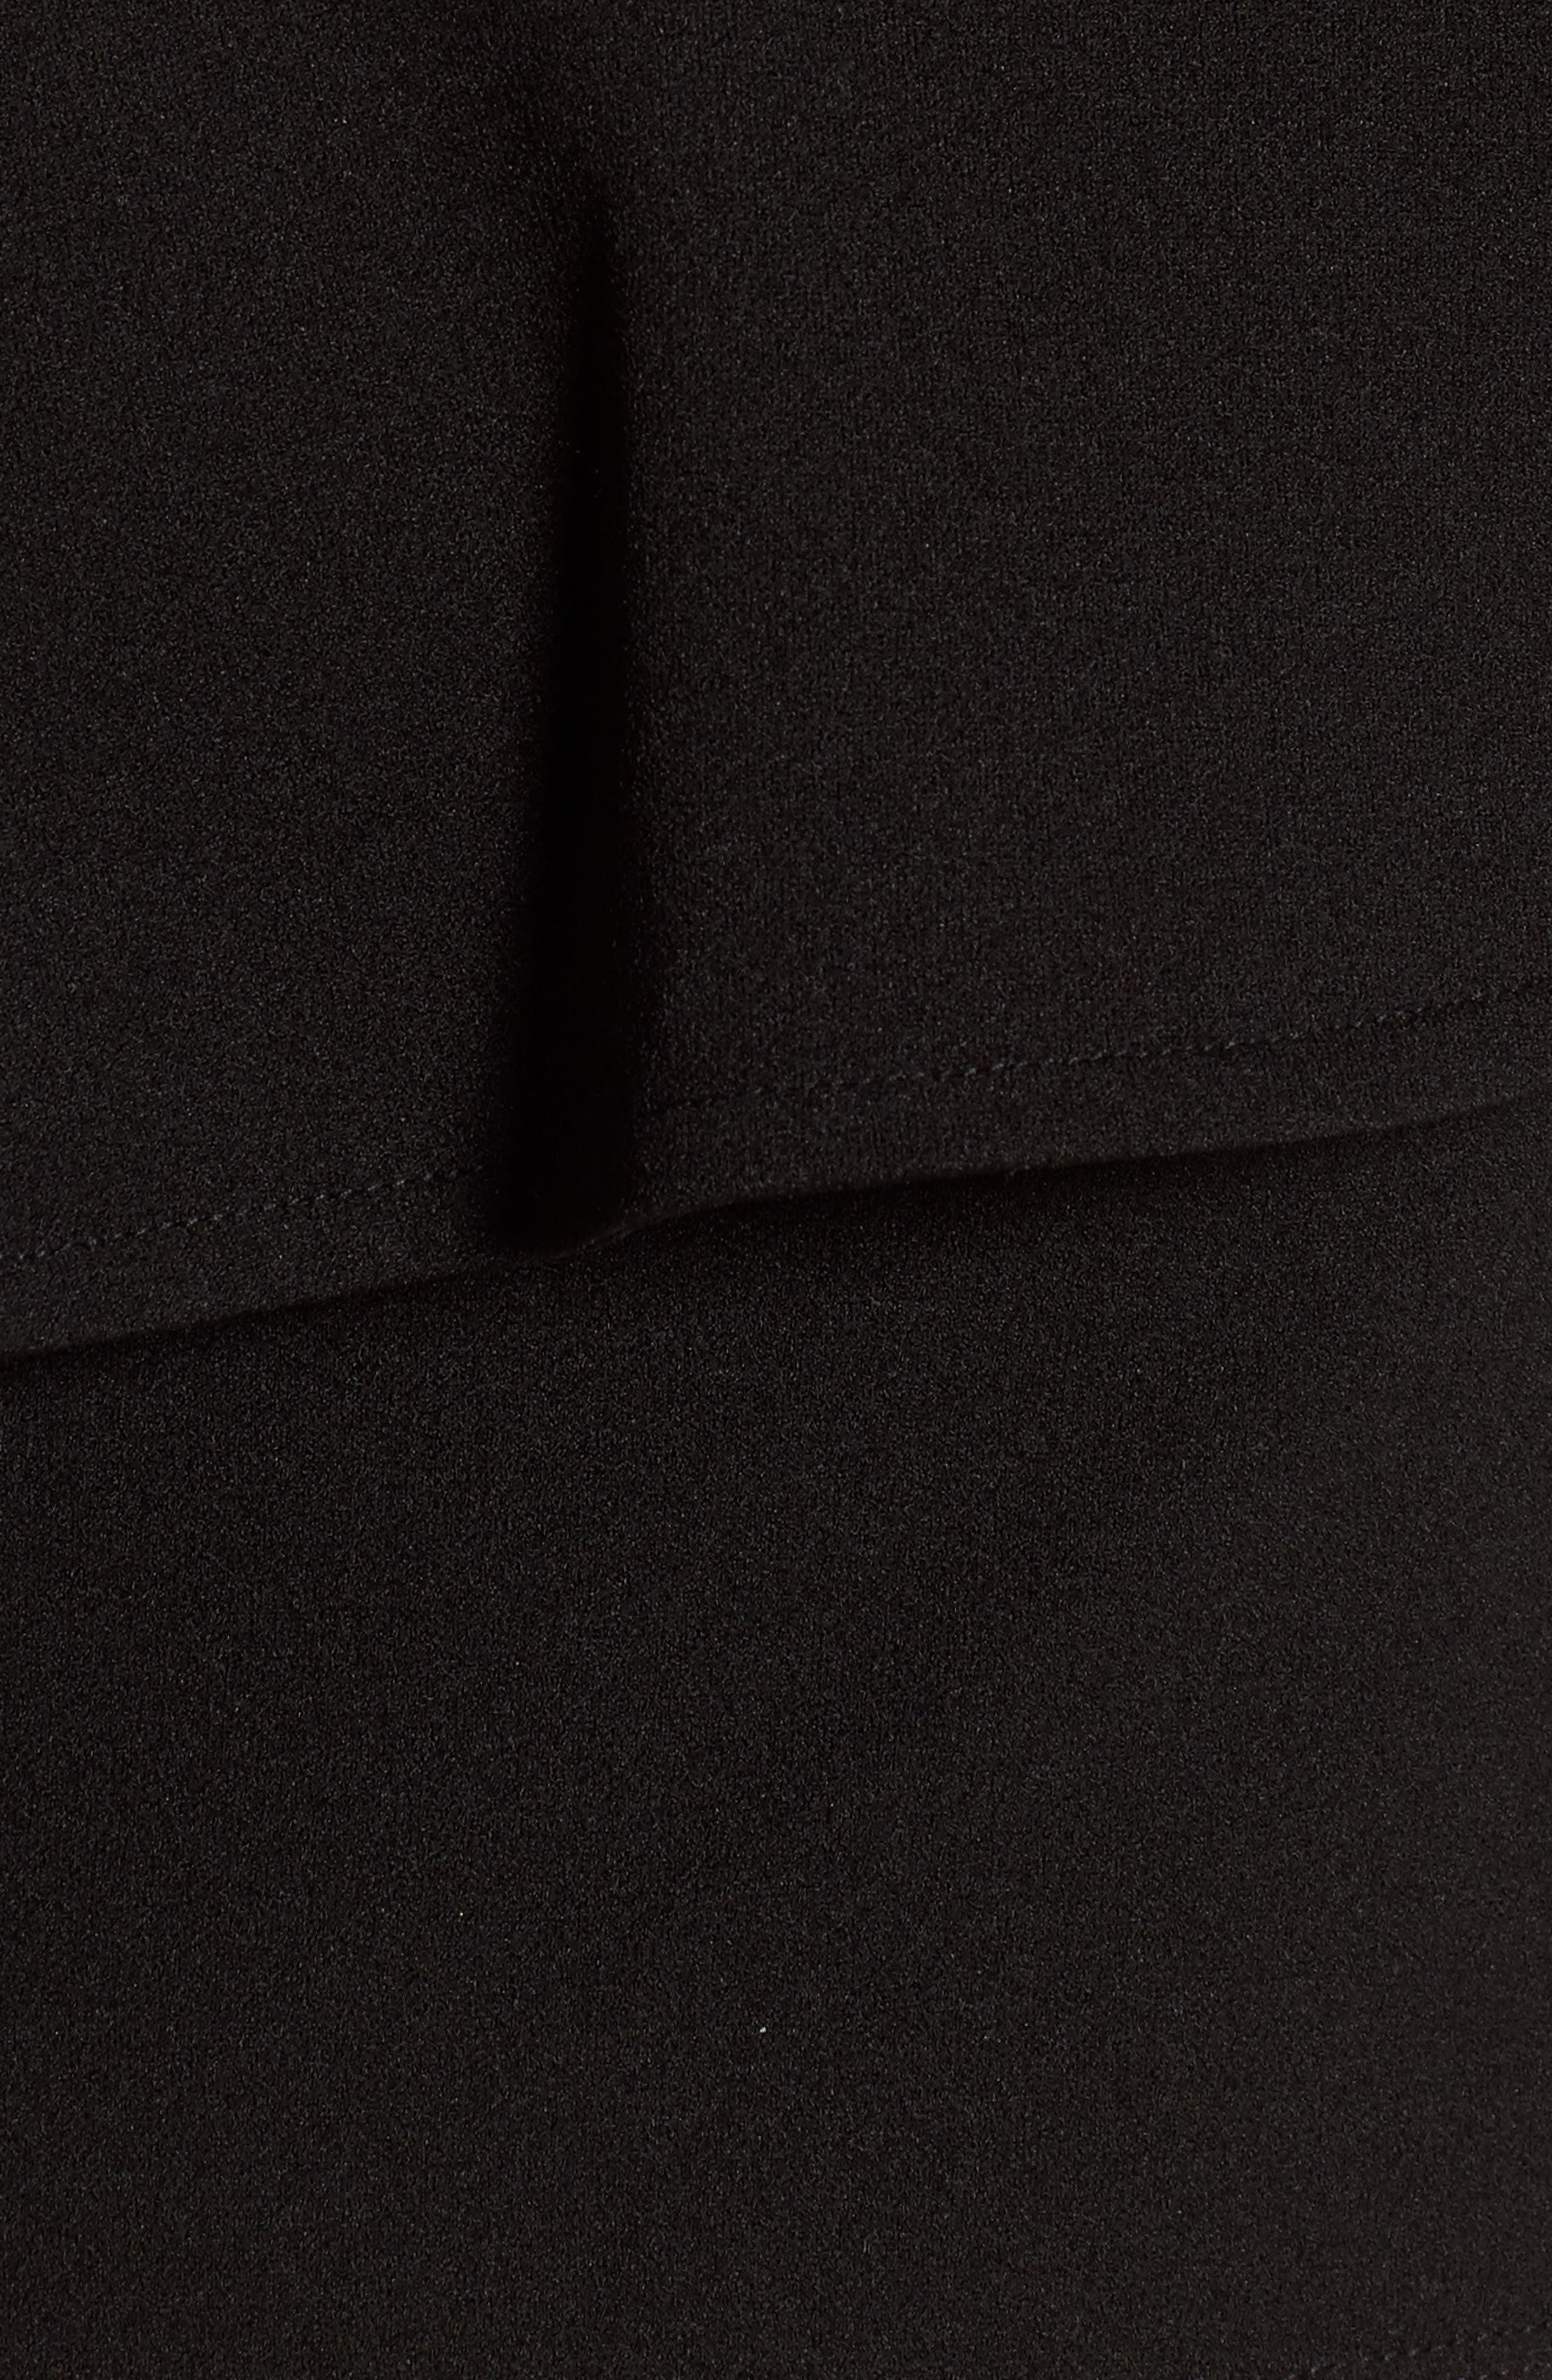 One-Shoulder Crop Top,                             Alternate thumbnail 5, color,                             Black